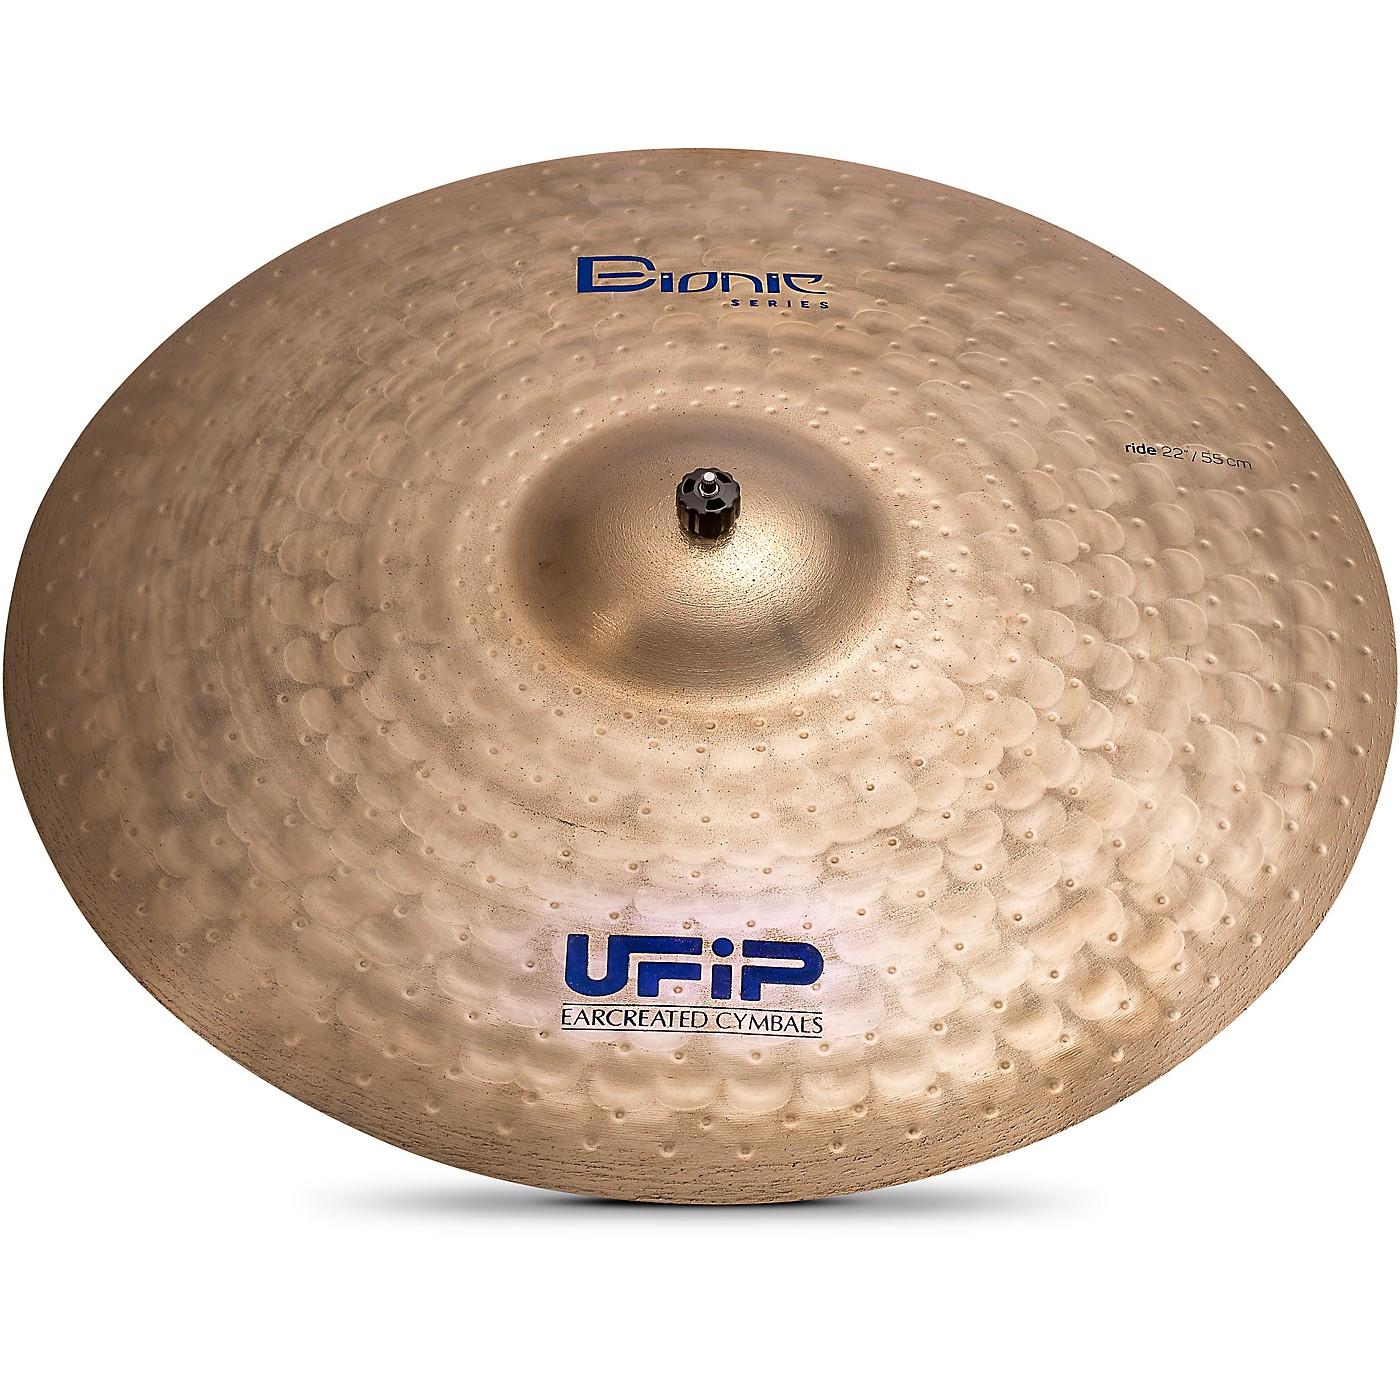 UFIP Bionic Series Heavy Ride Cymbal thumbnail